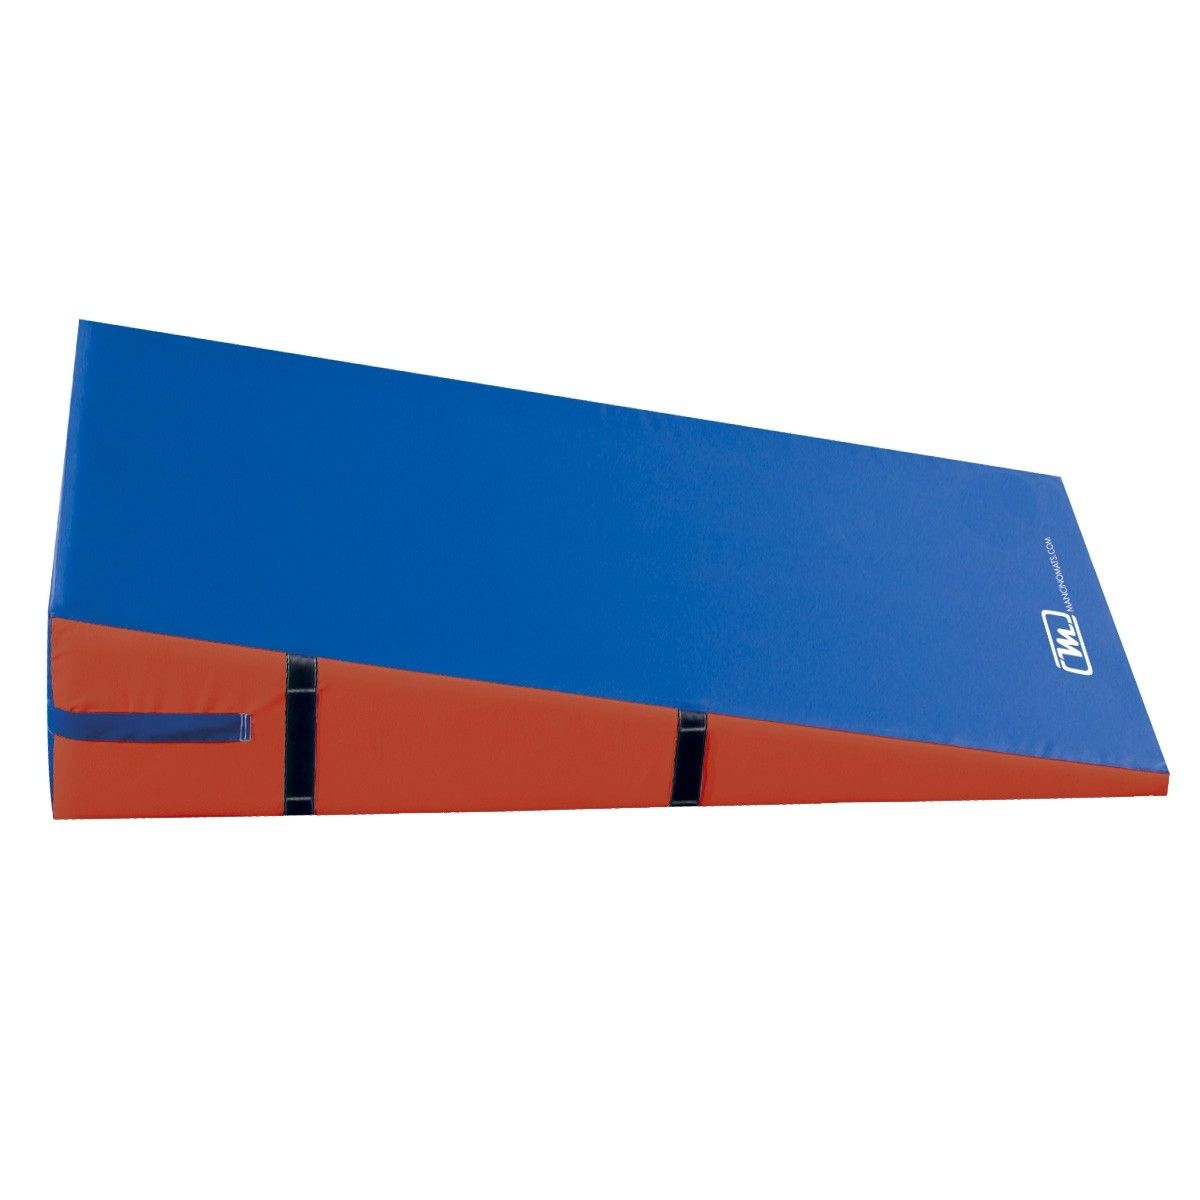 handstand life tumbl gymnasts mats package pin trak my is incline mat tumbling gymnastics